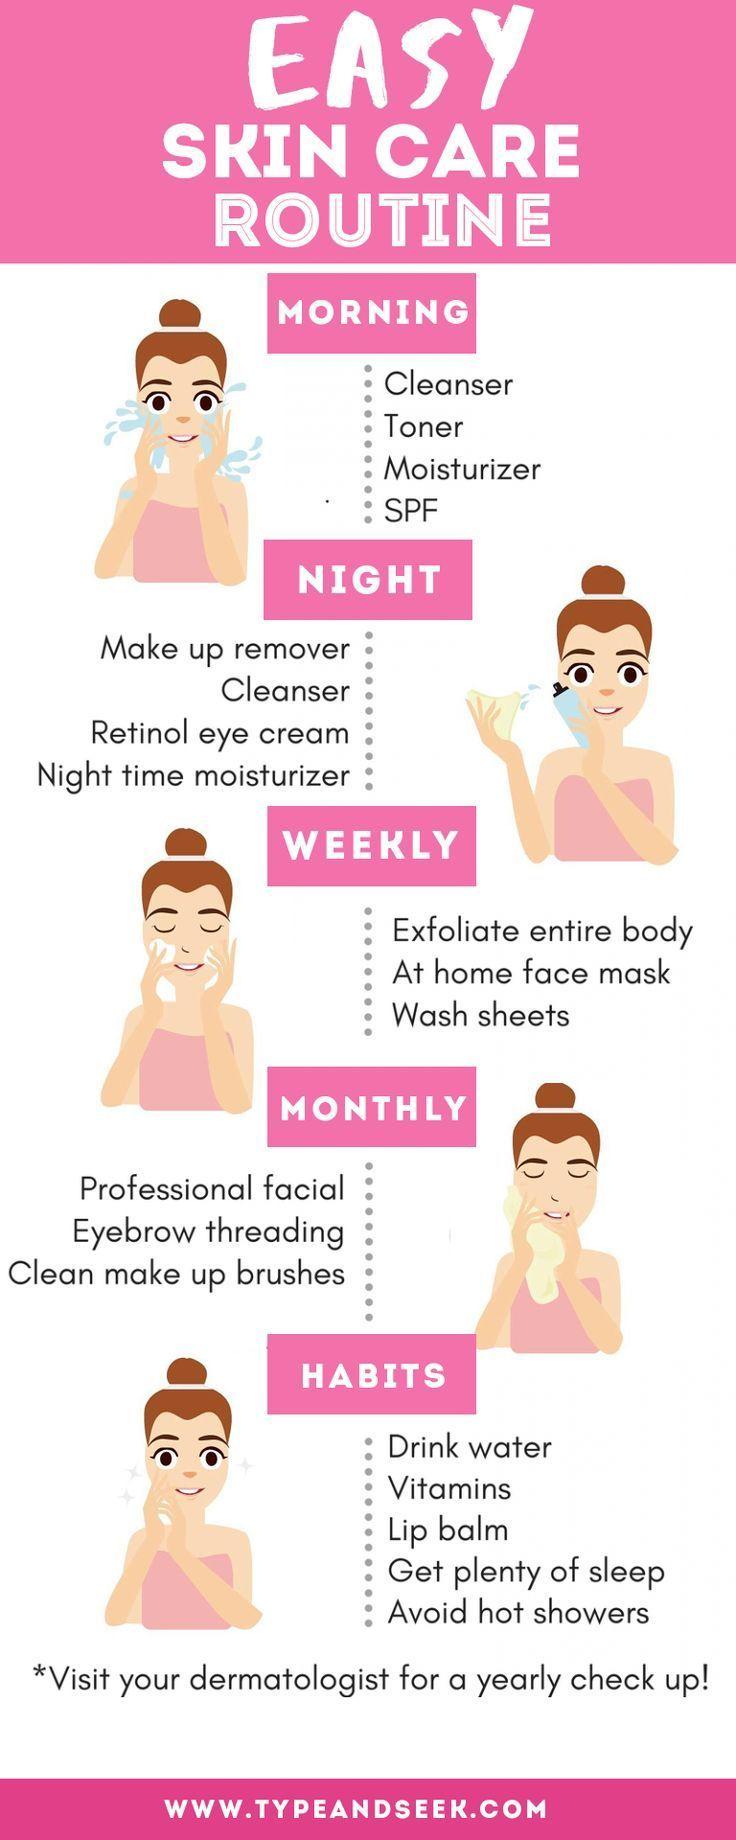 Easy Skin Care Routine That Works Wonders! in 12  Simple